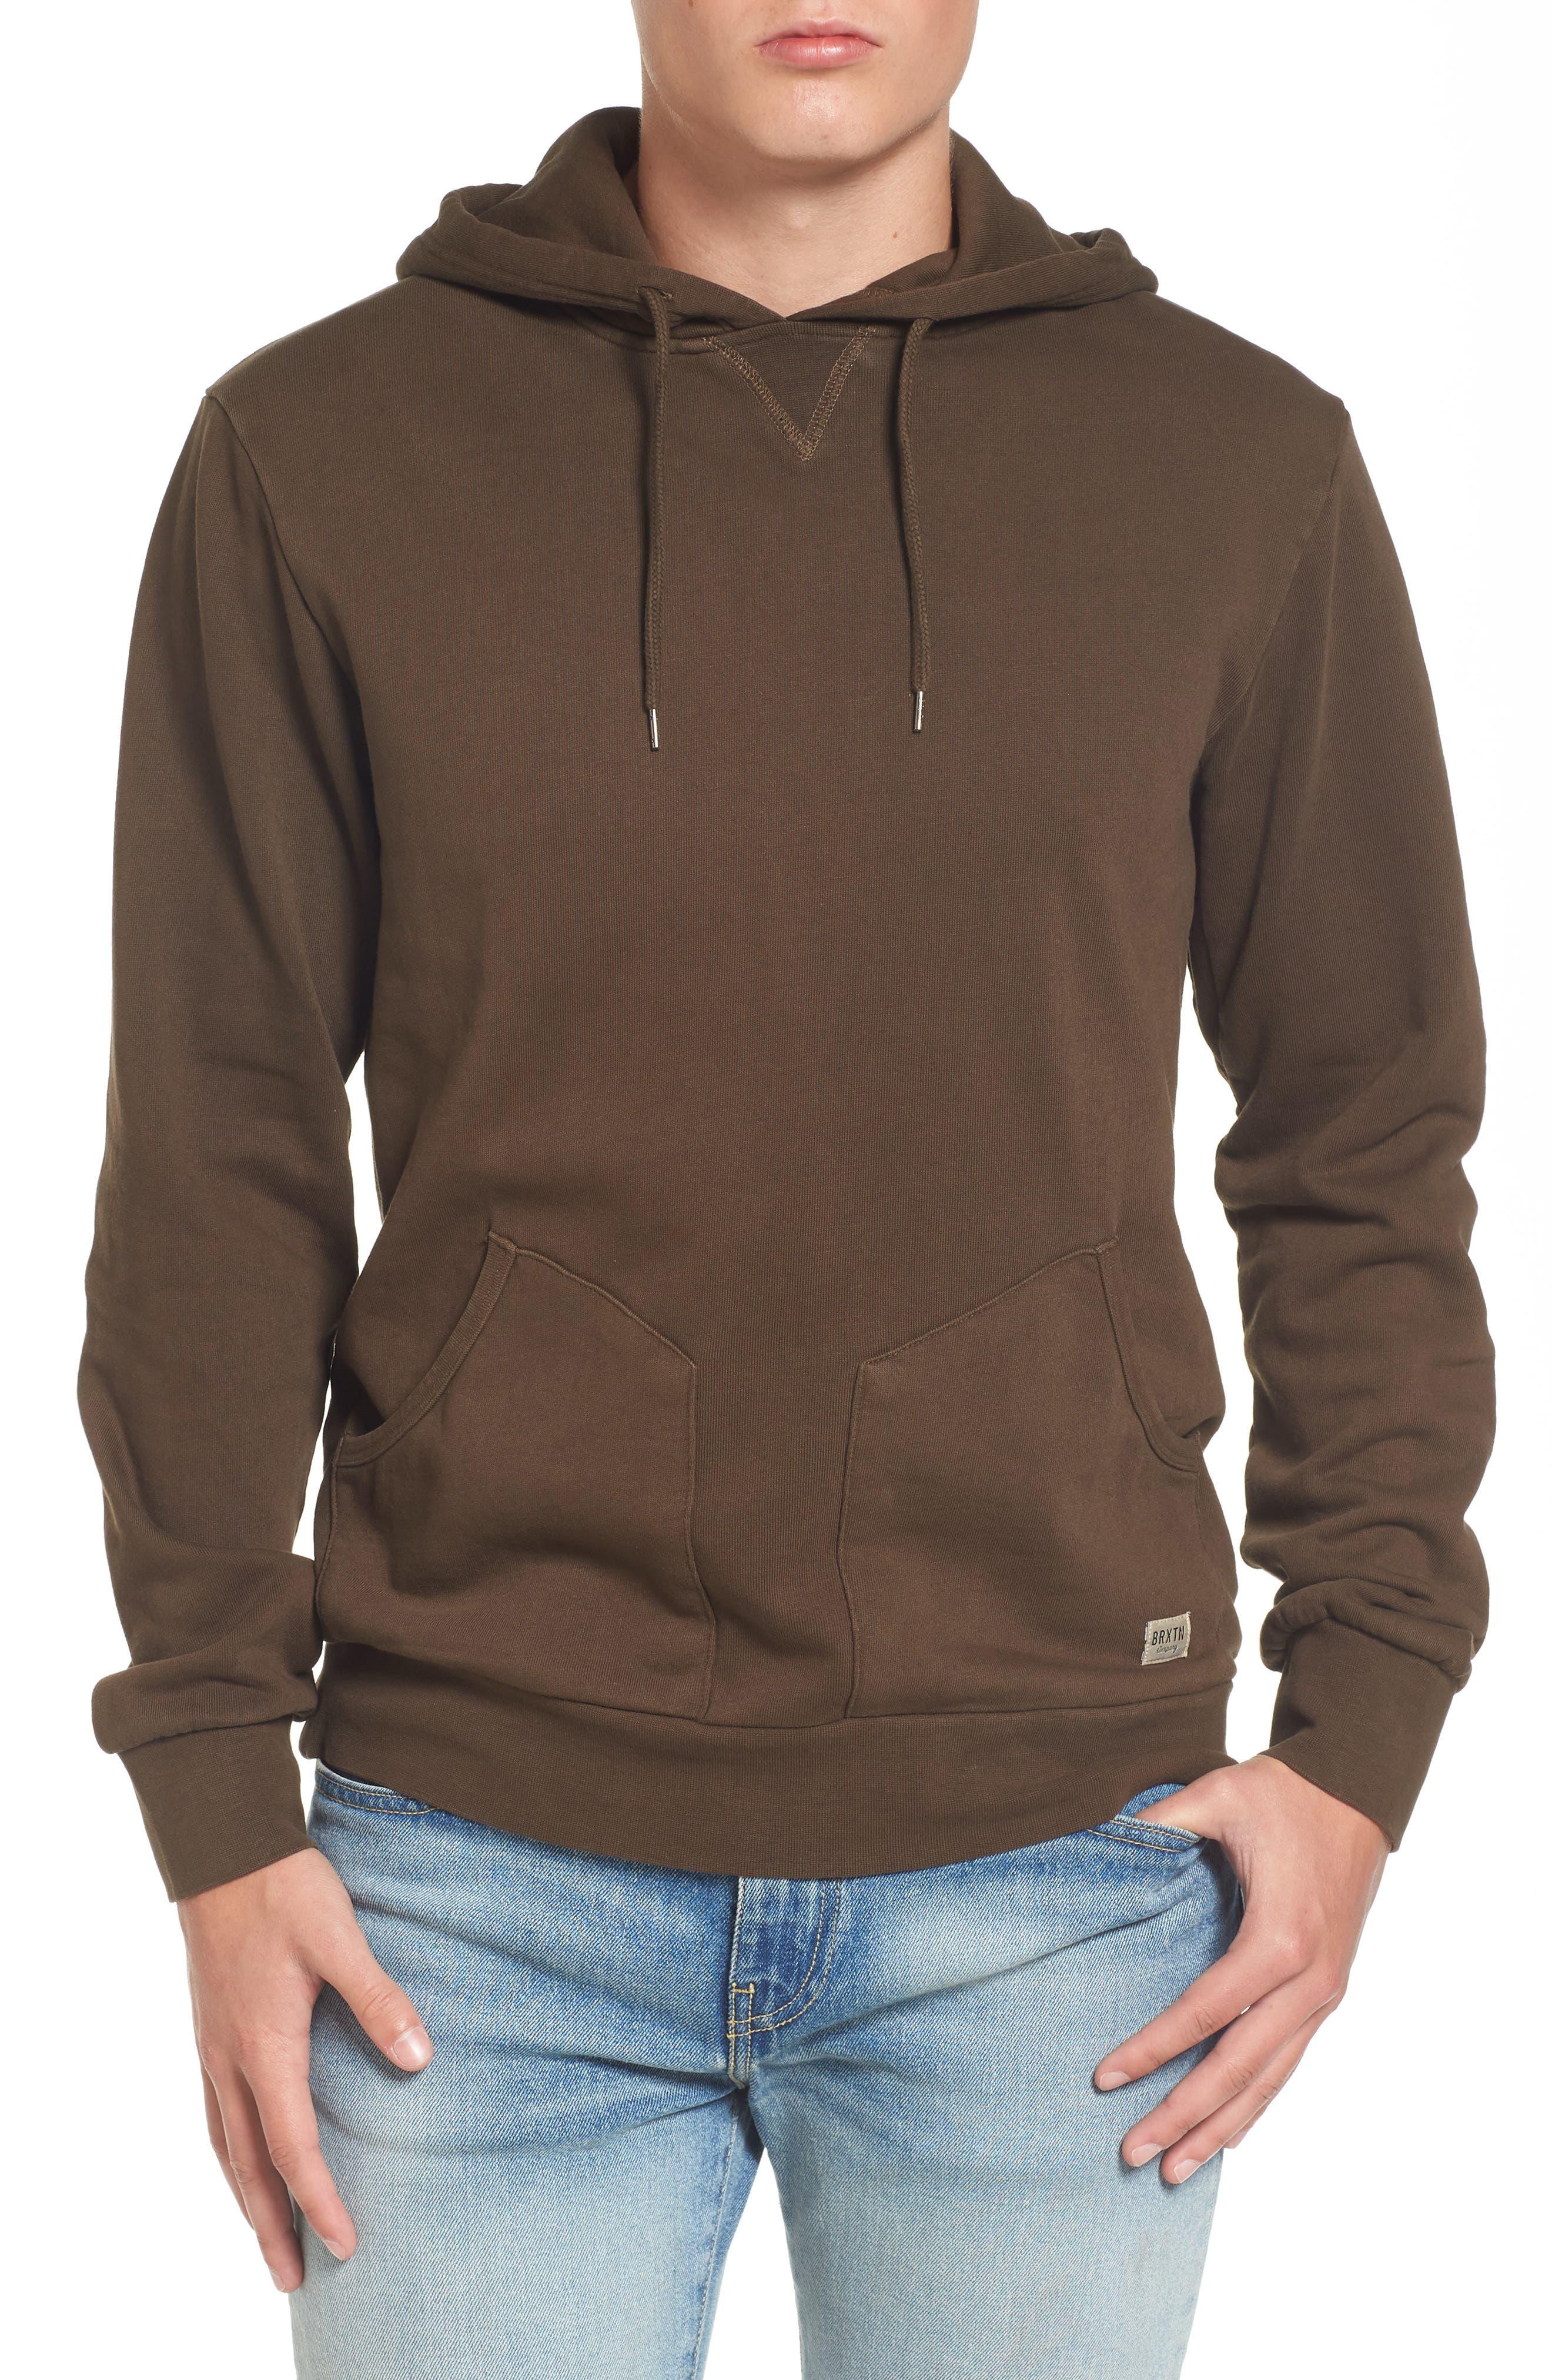 Hooded Fleece Sweatshirt,                             Main thumbnail 1, color,                             Washed Brown